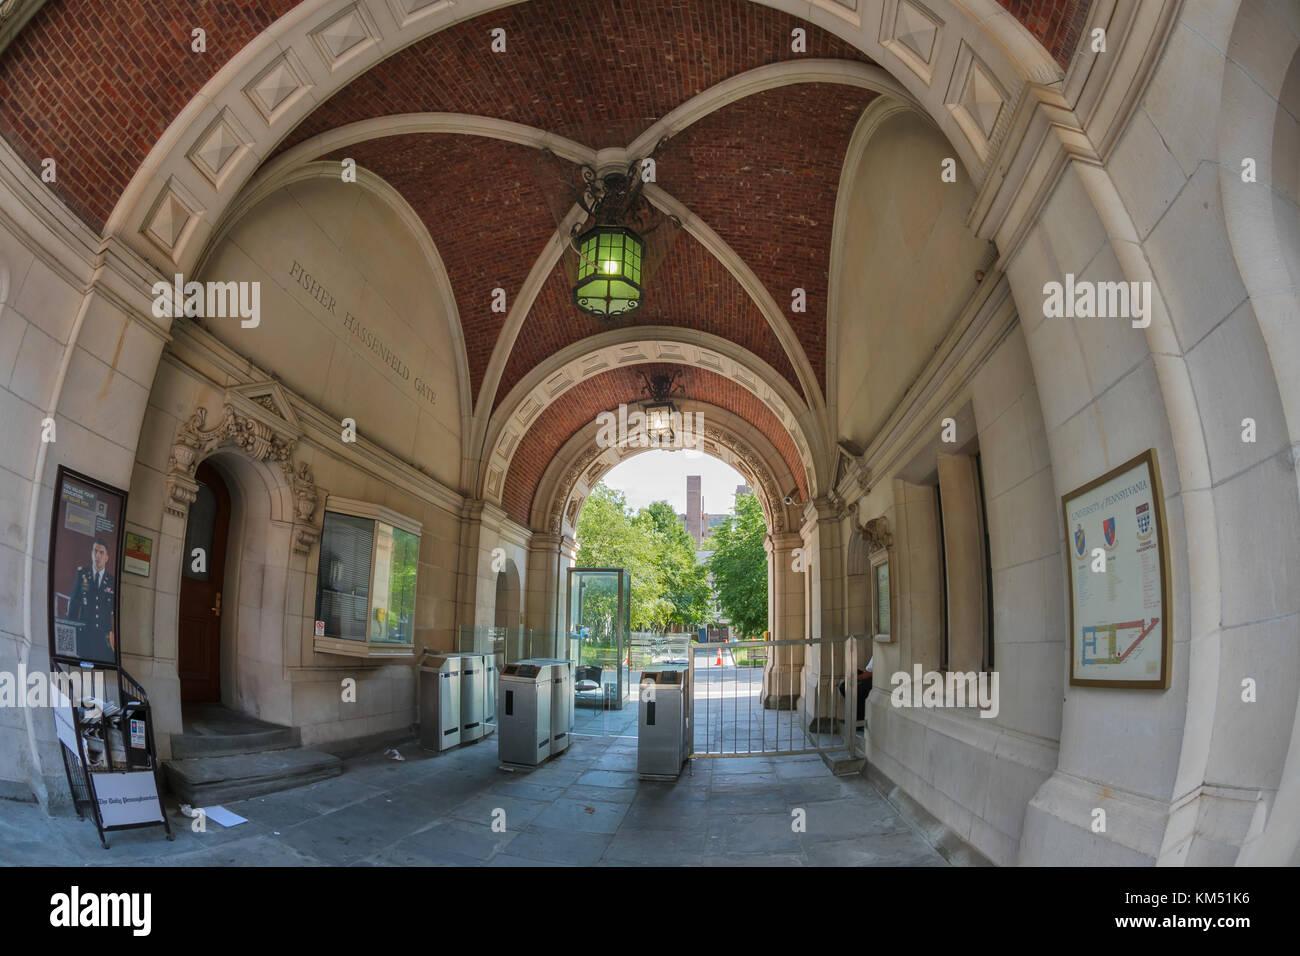 La famosa Universidad de Pensilvania, Filadelfia, EE.UU. Imagen De Stock